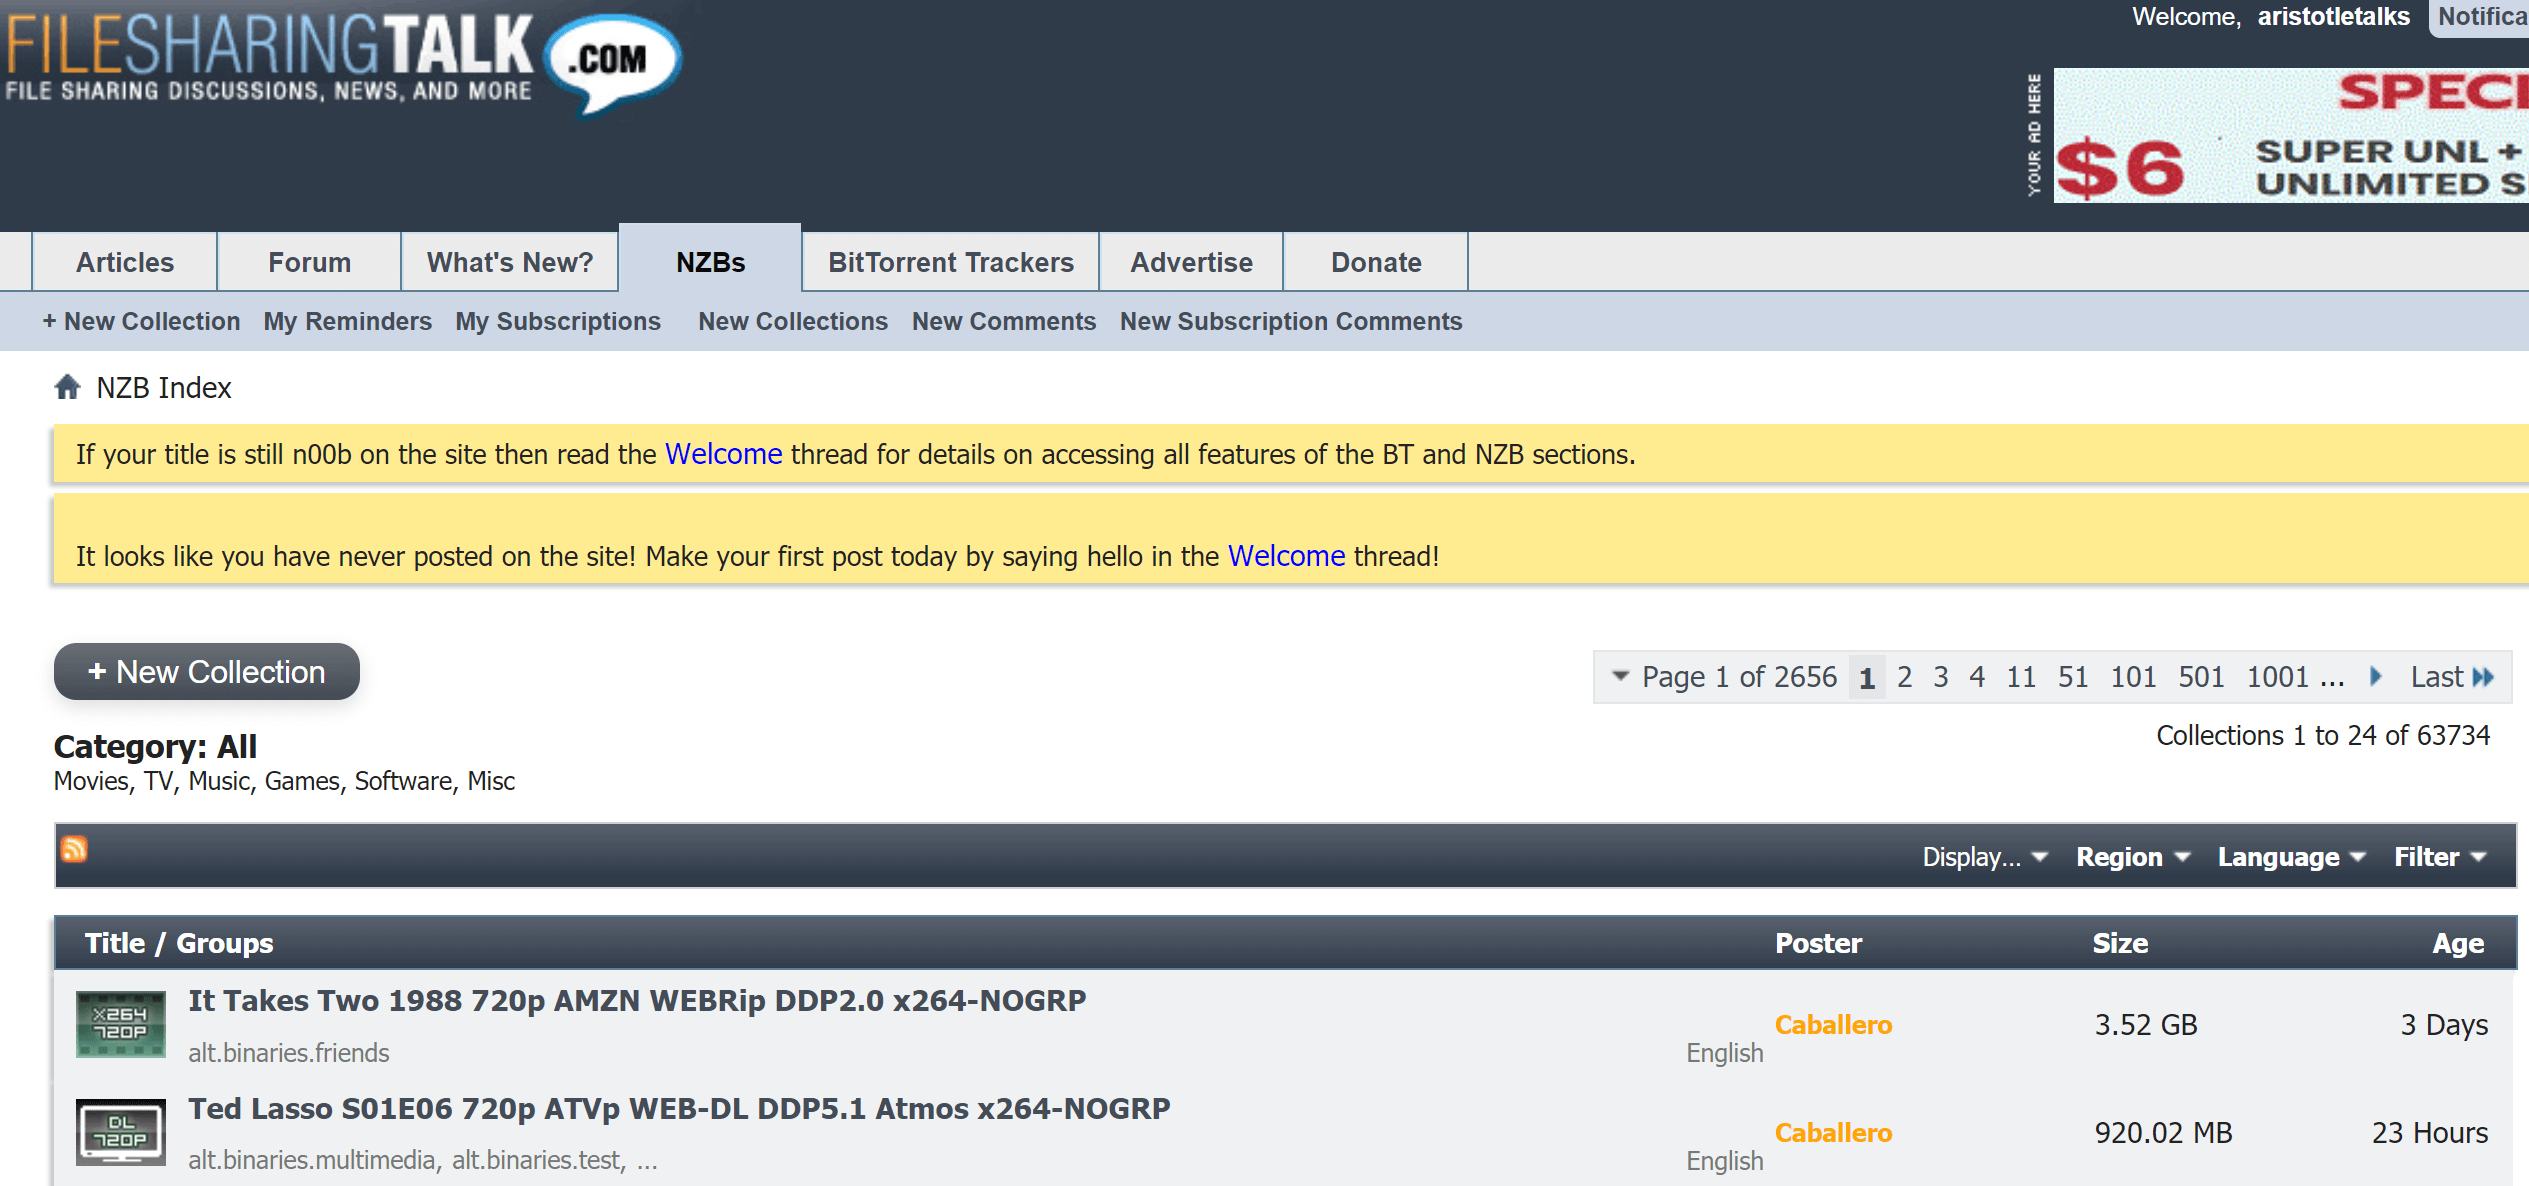 filesharingtalk nzb site (forum)